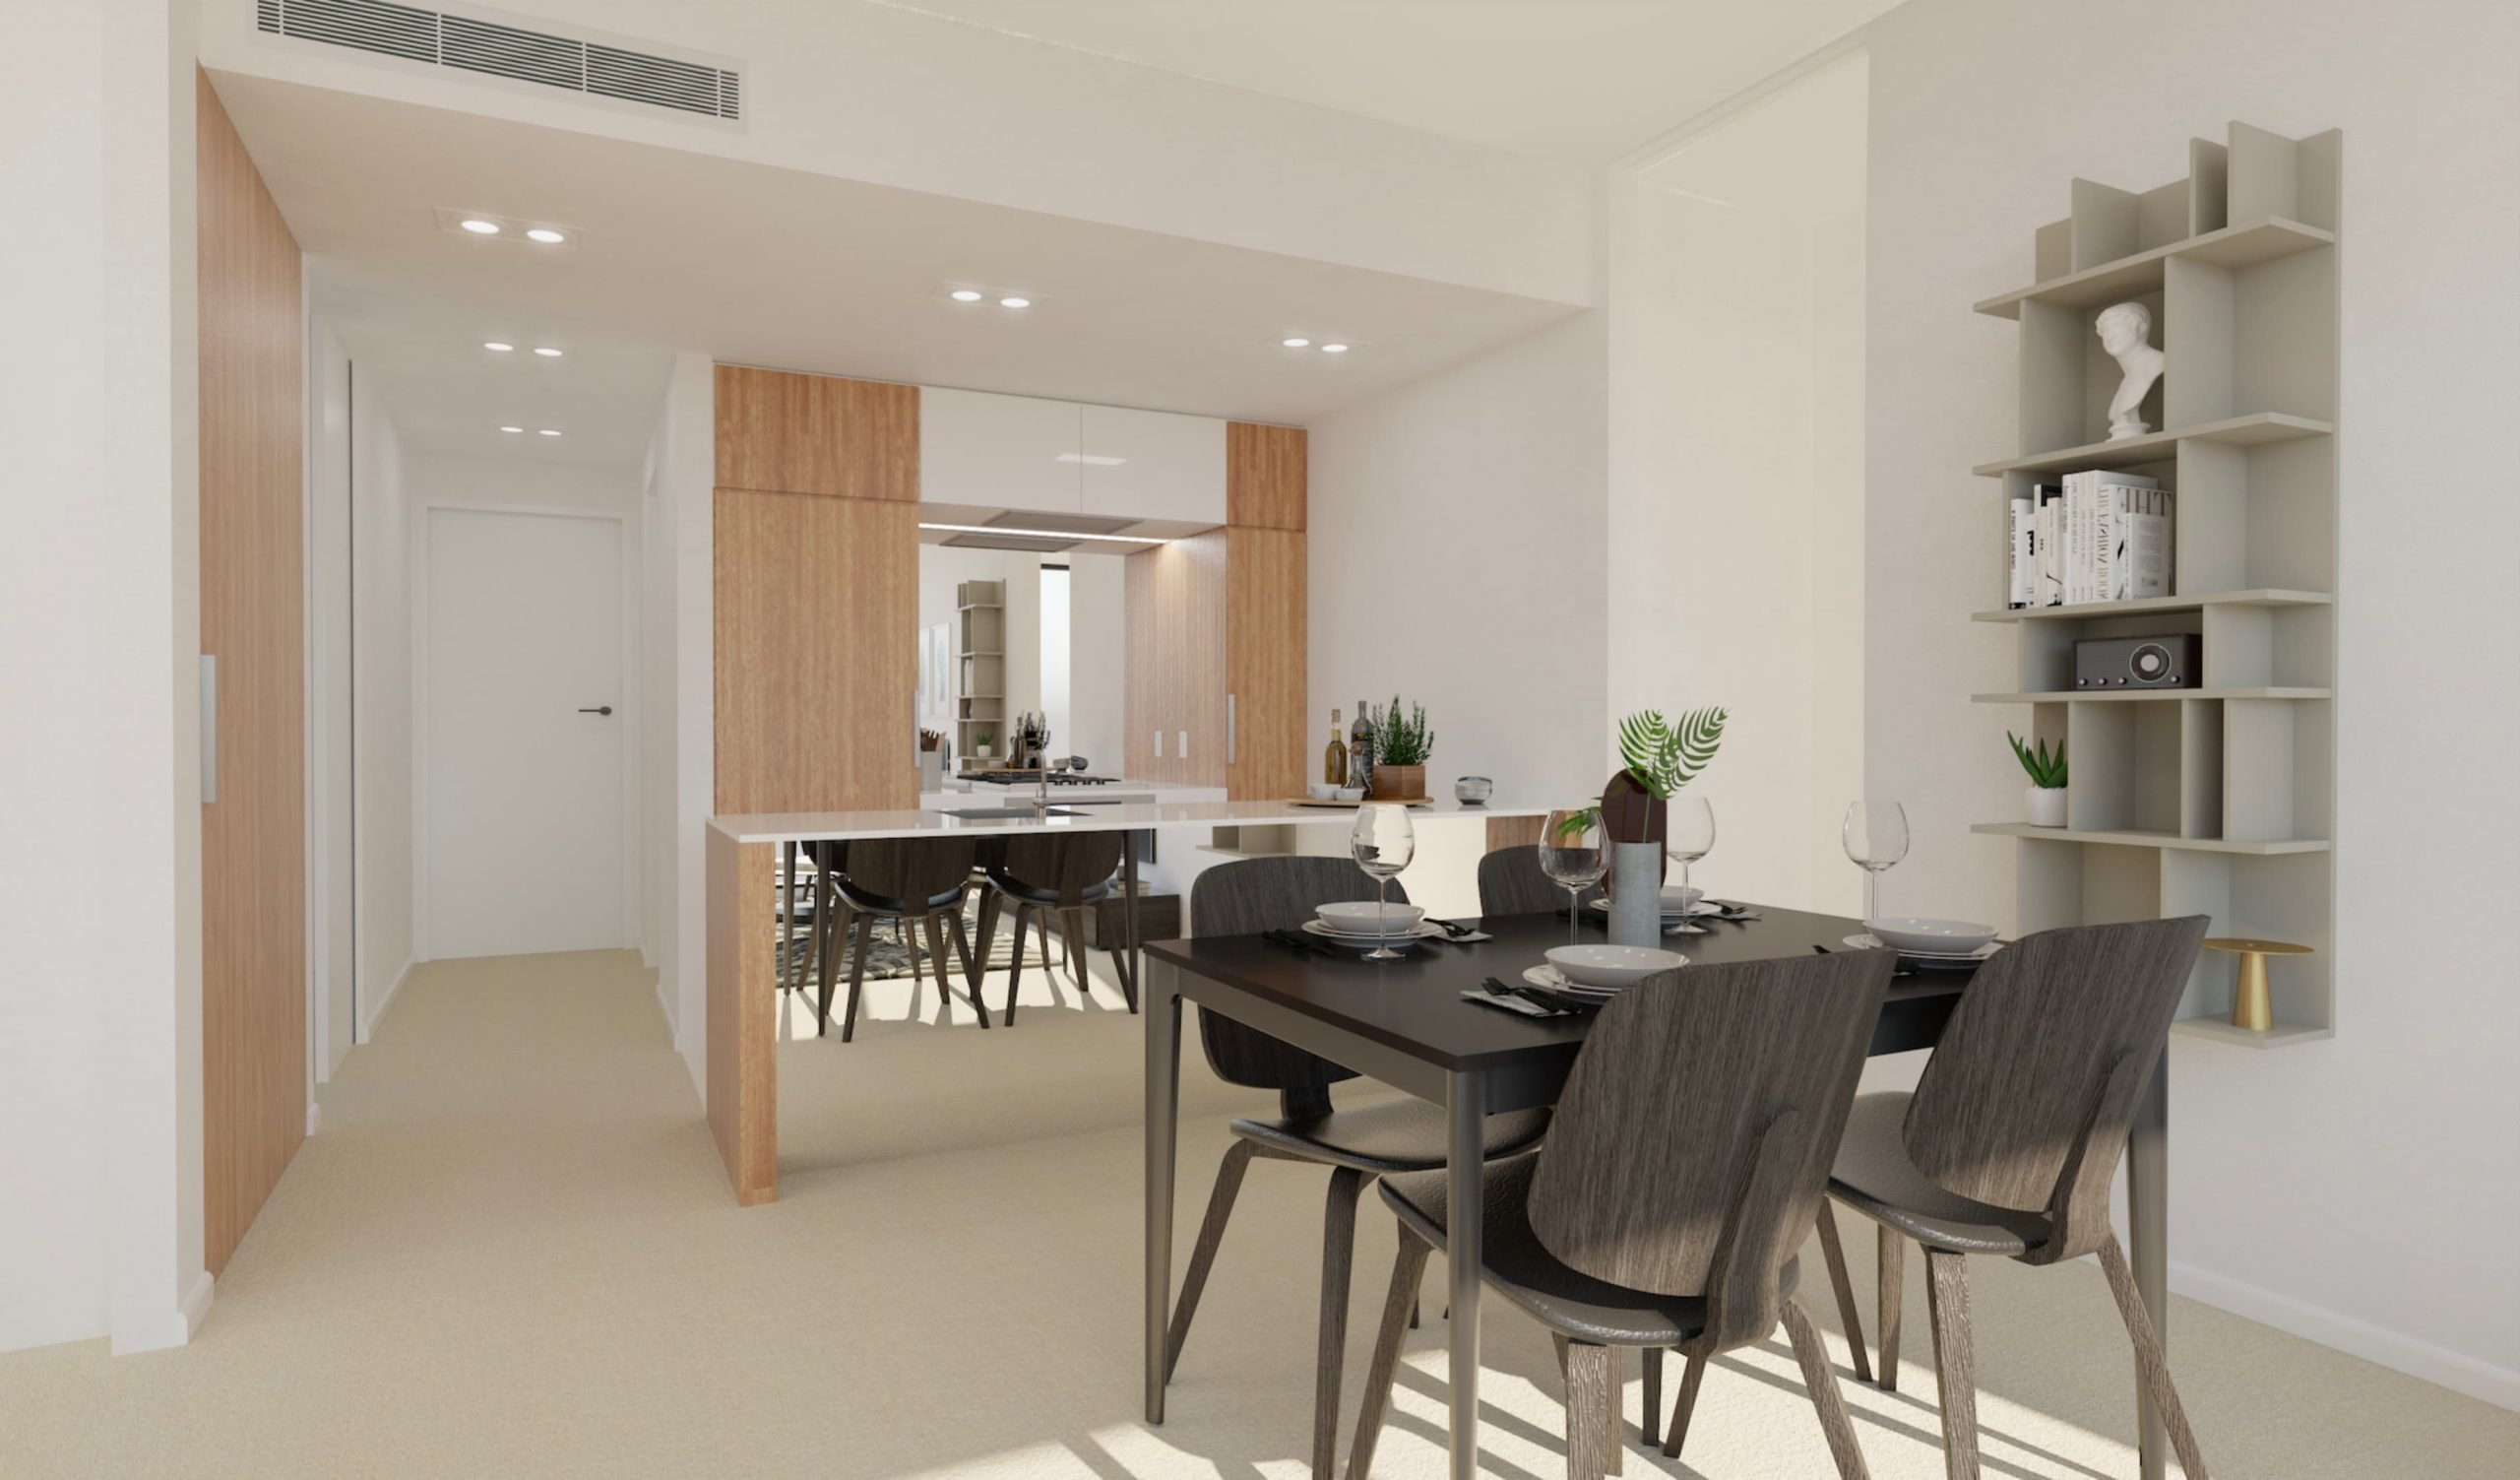 12/12 Dining Room, Loft, Design Package